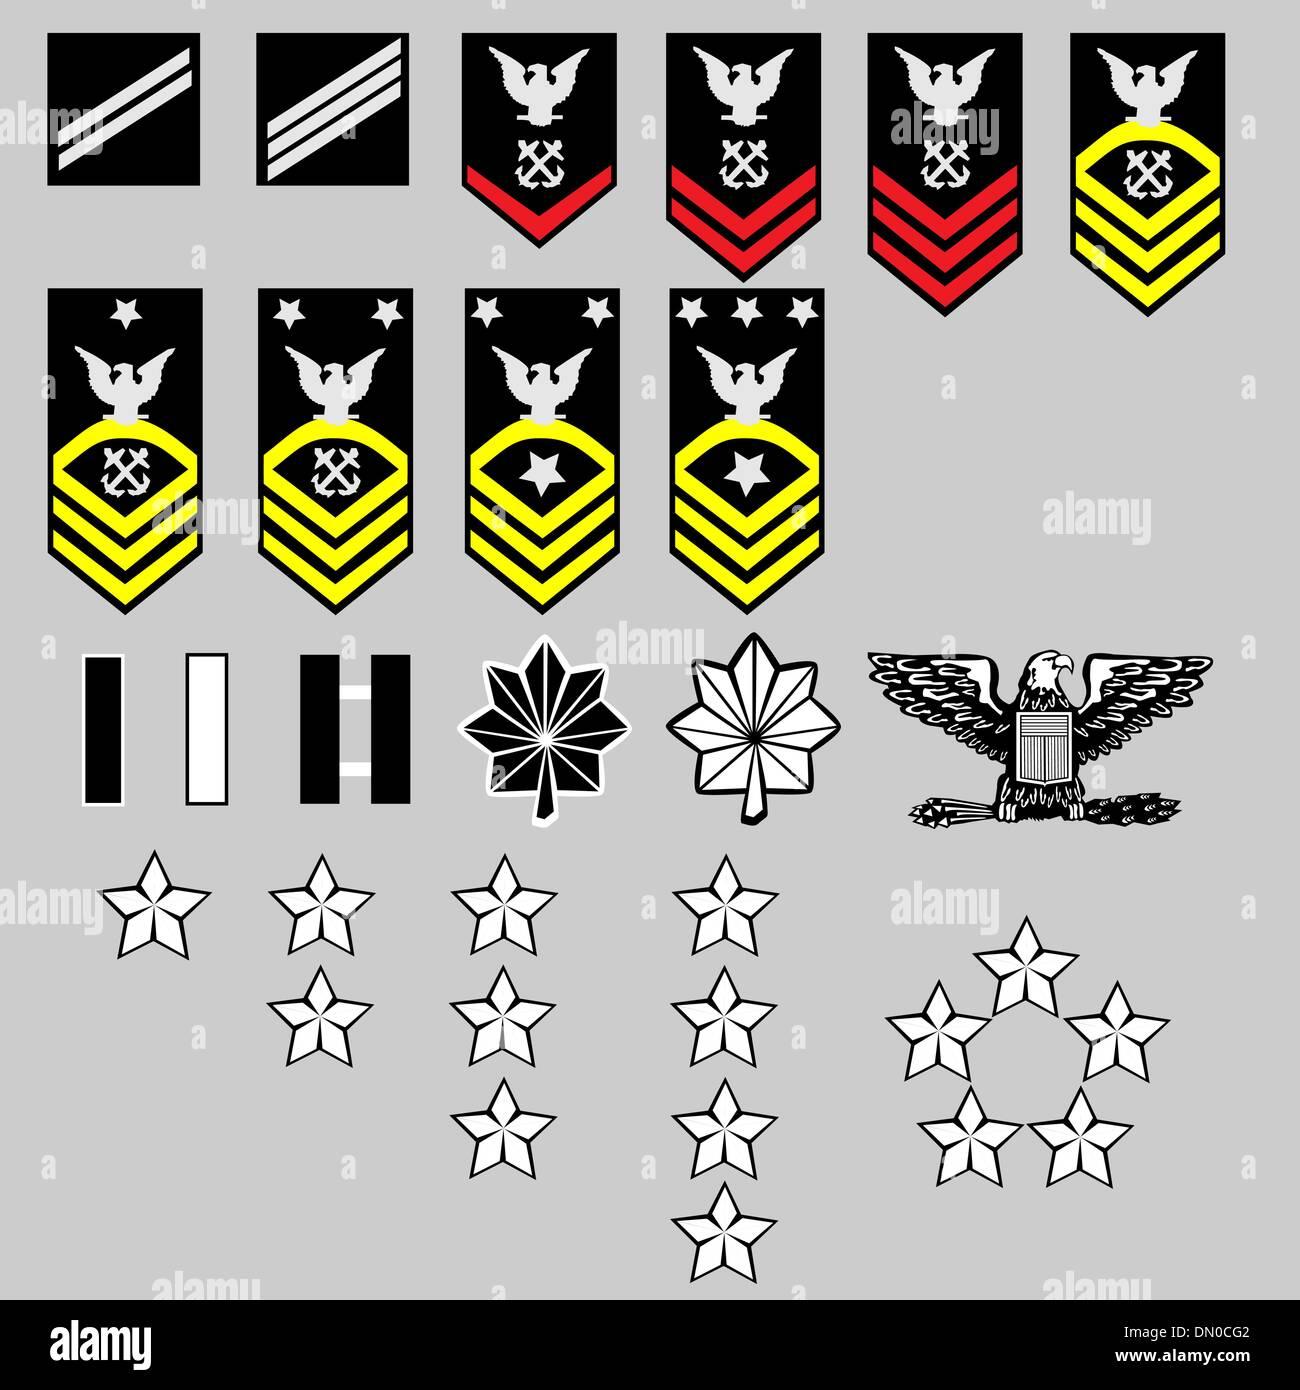 Us navy rank insignia stock vector art illustration vector us navy rank insignia biocorpaavc